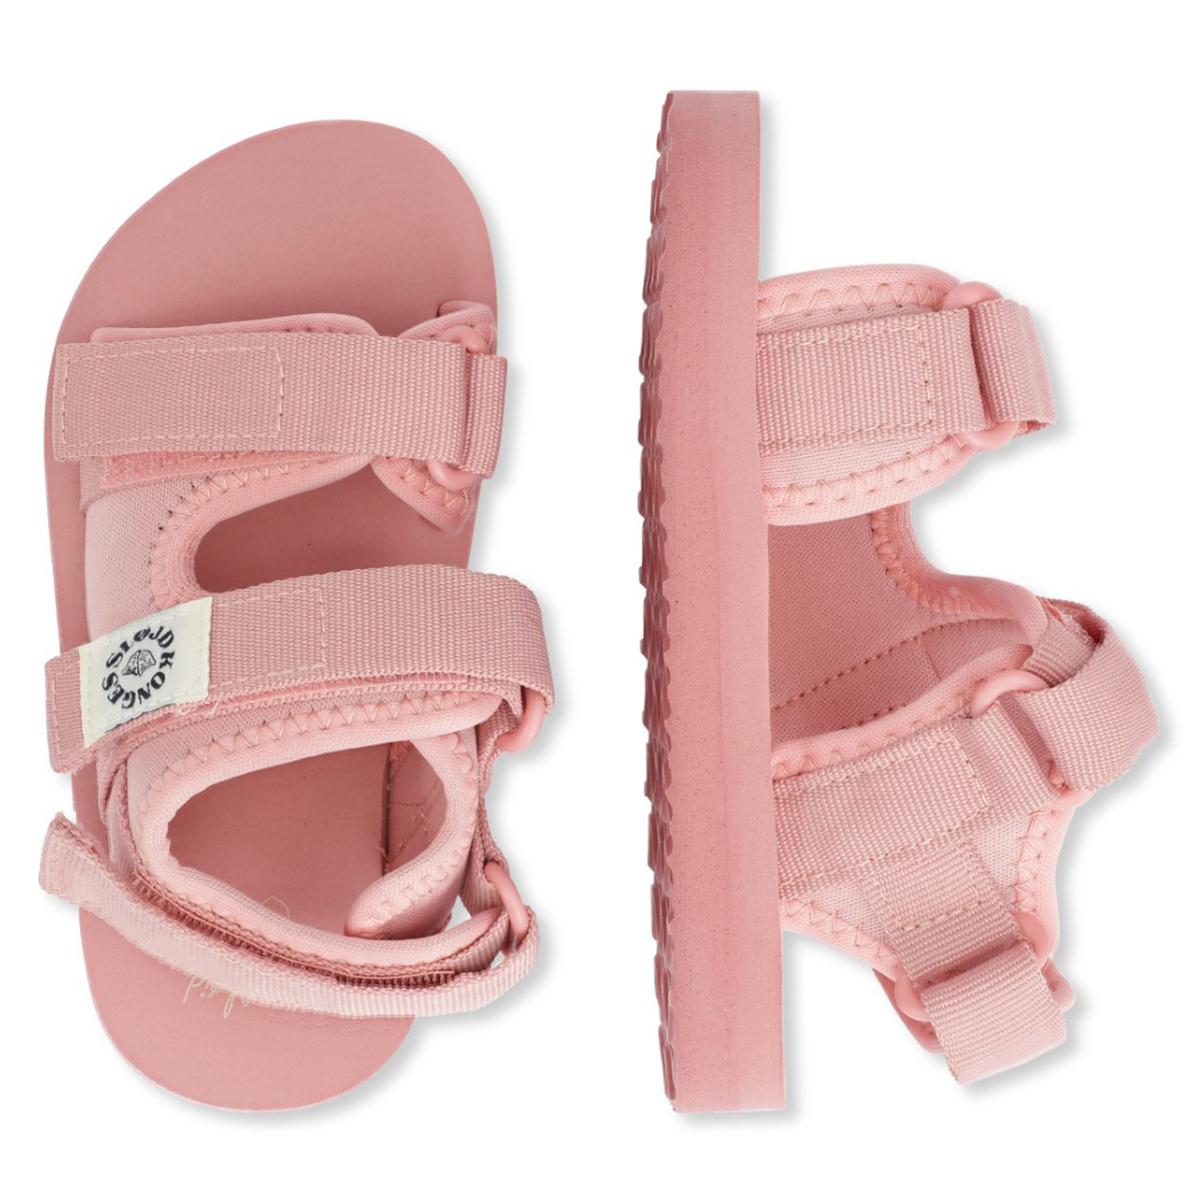 Chaussons & Chaussures Sandales Sun Macaron - 24 Sandales Sun Macaron - 24